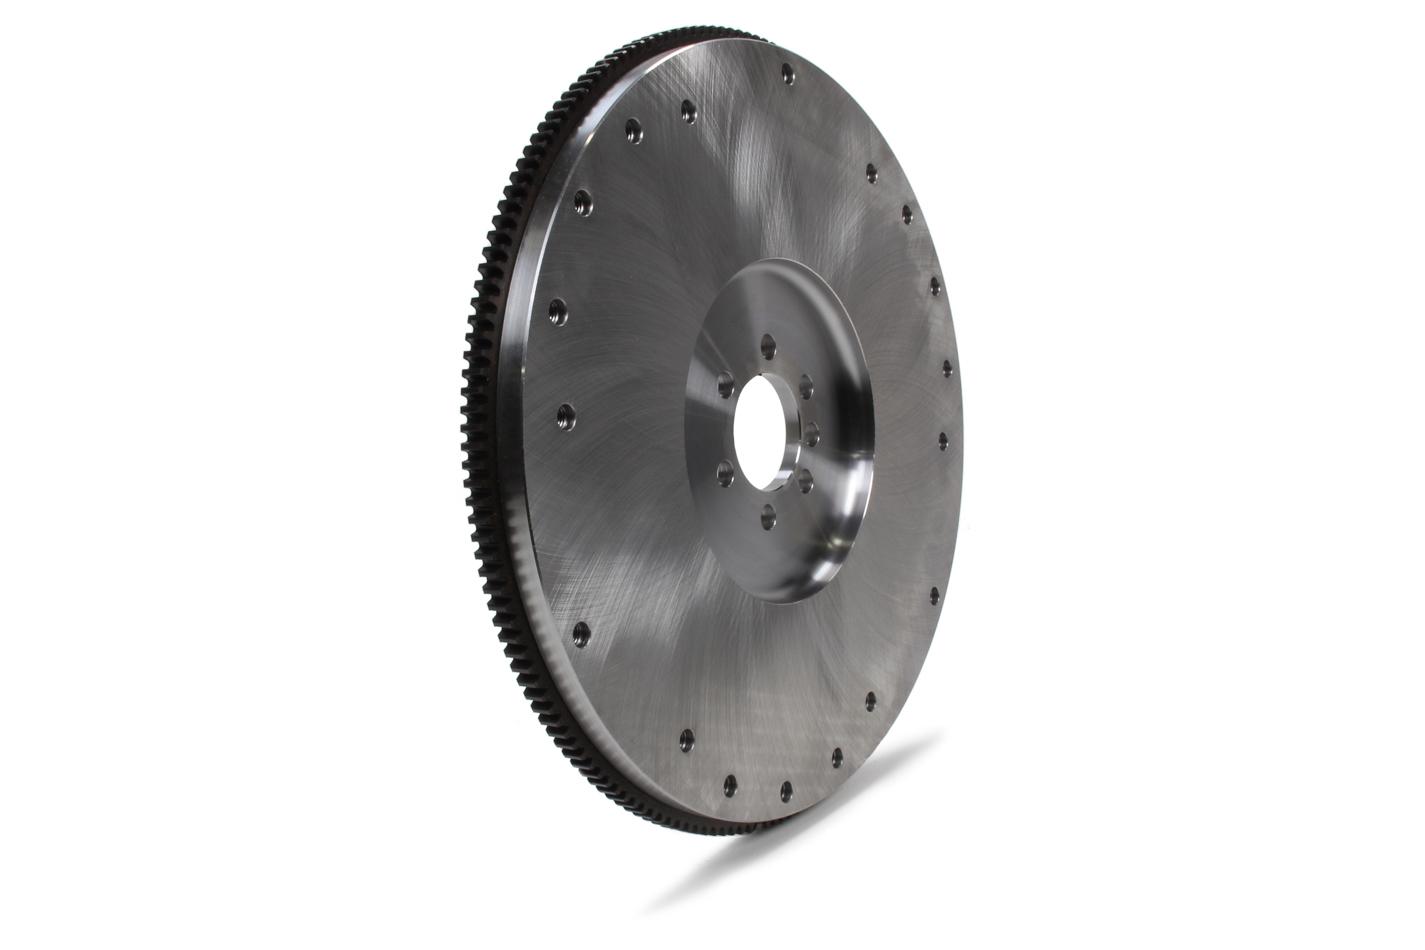 Ram Clutch 1530LW Flywheel, 168 Tooth, 25 lb, SFI 1.1, Steel, Natural, External Balance, Small Block Chevy / GM V6, Each